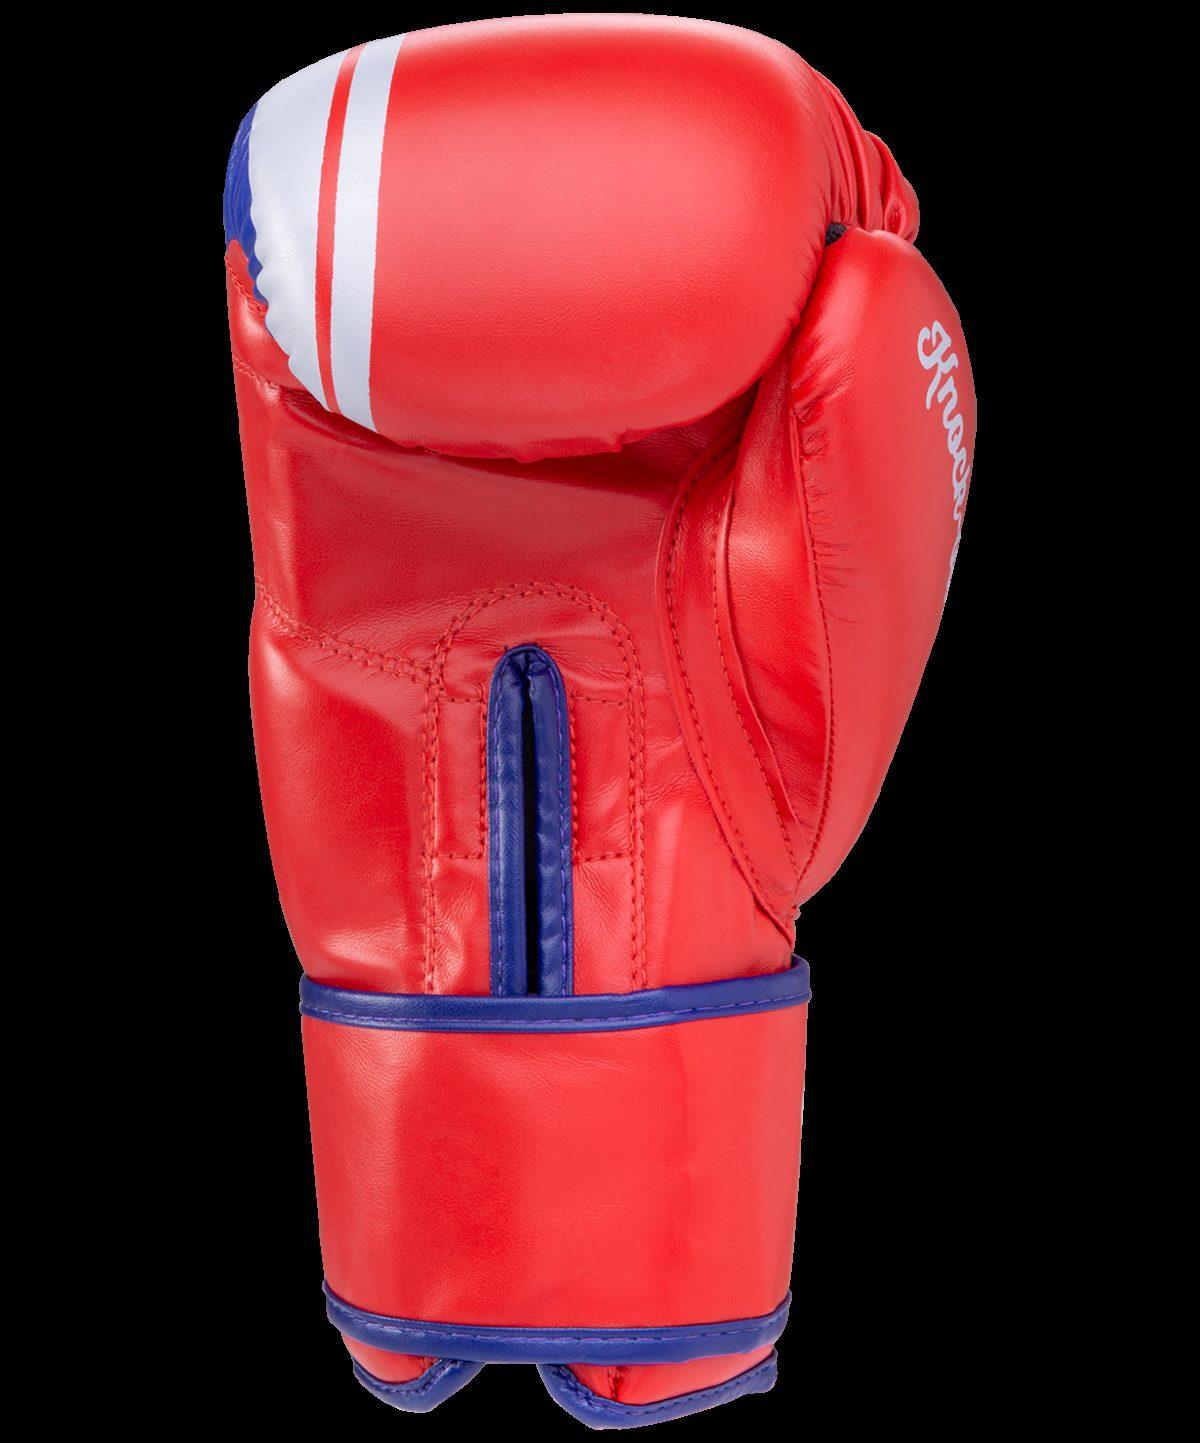 GREEN HILL Перчатки боксерские 10 oz Knockout  BGK-2266: красный - 3